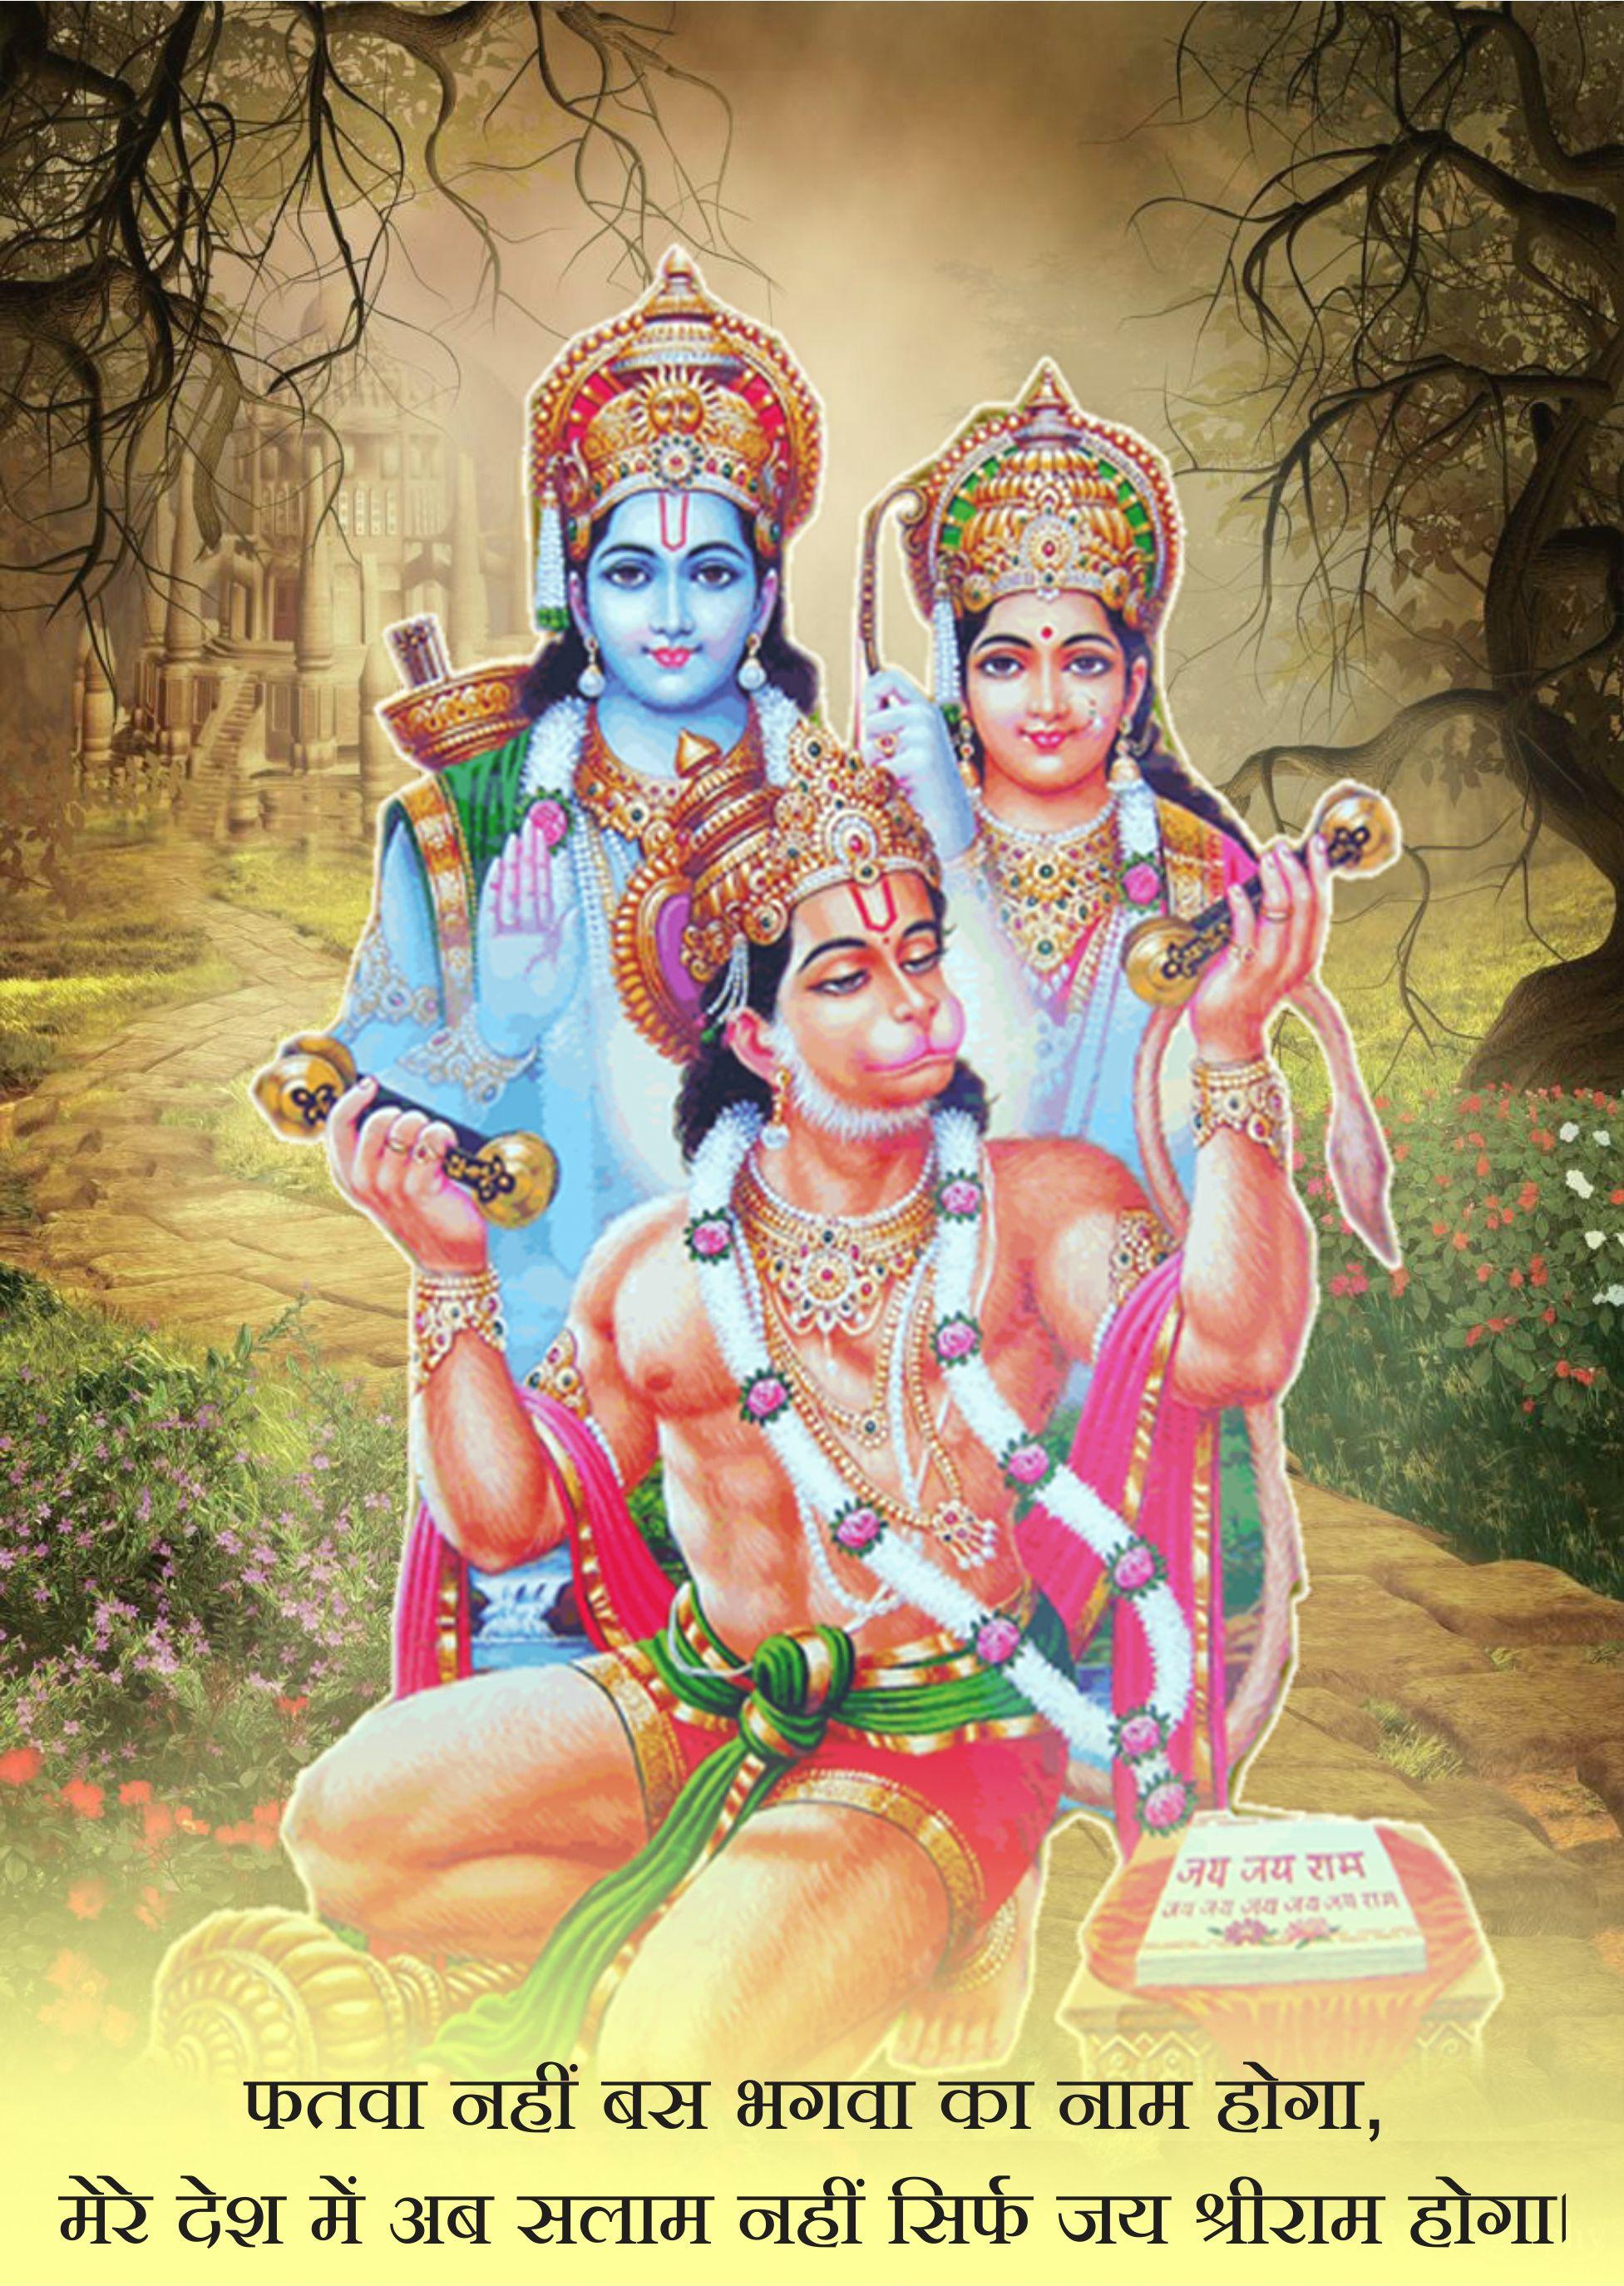 bhagwan shri ram whatsapp status hd wallpaper and images